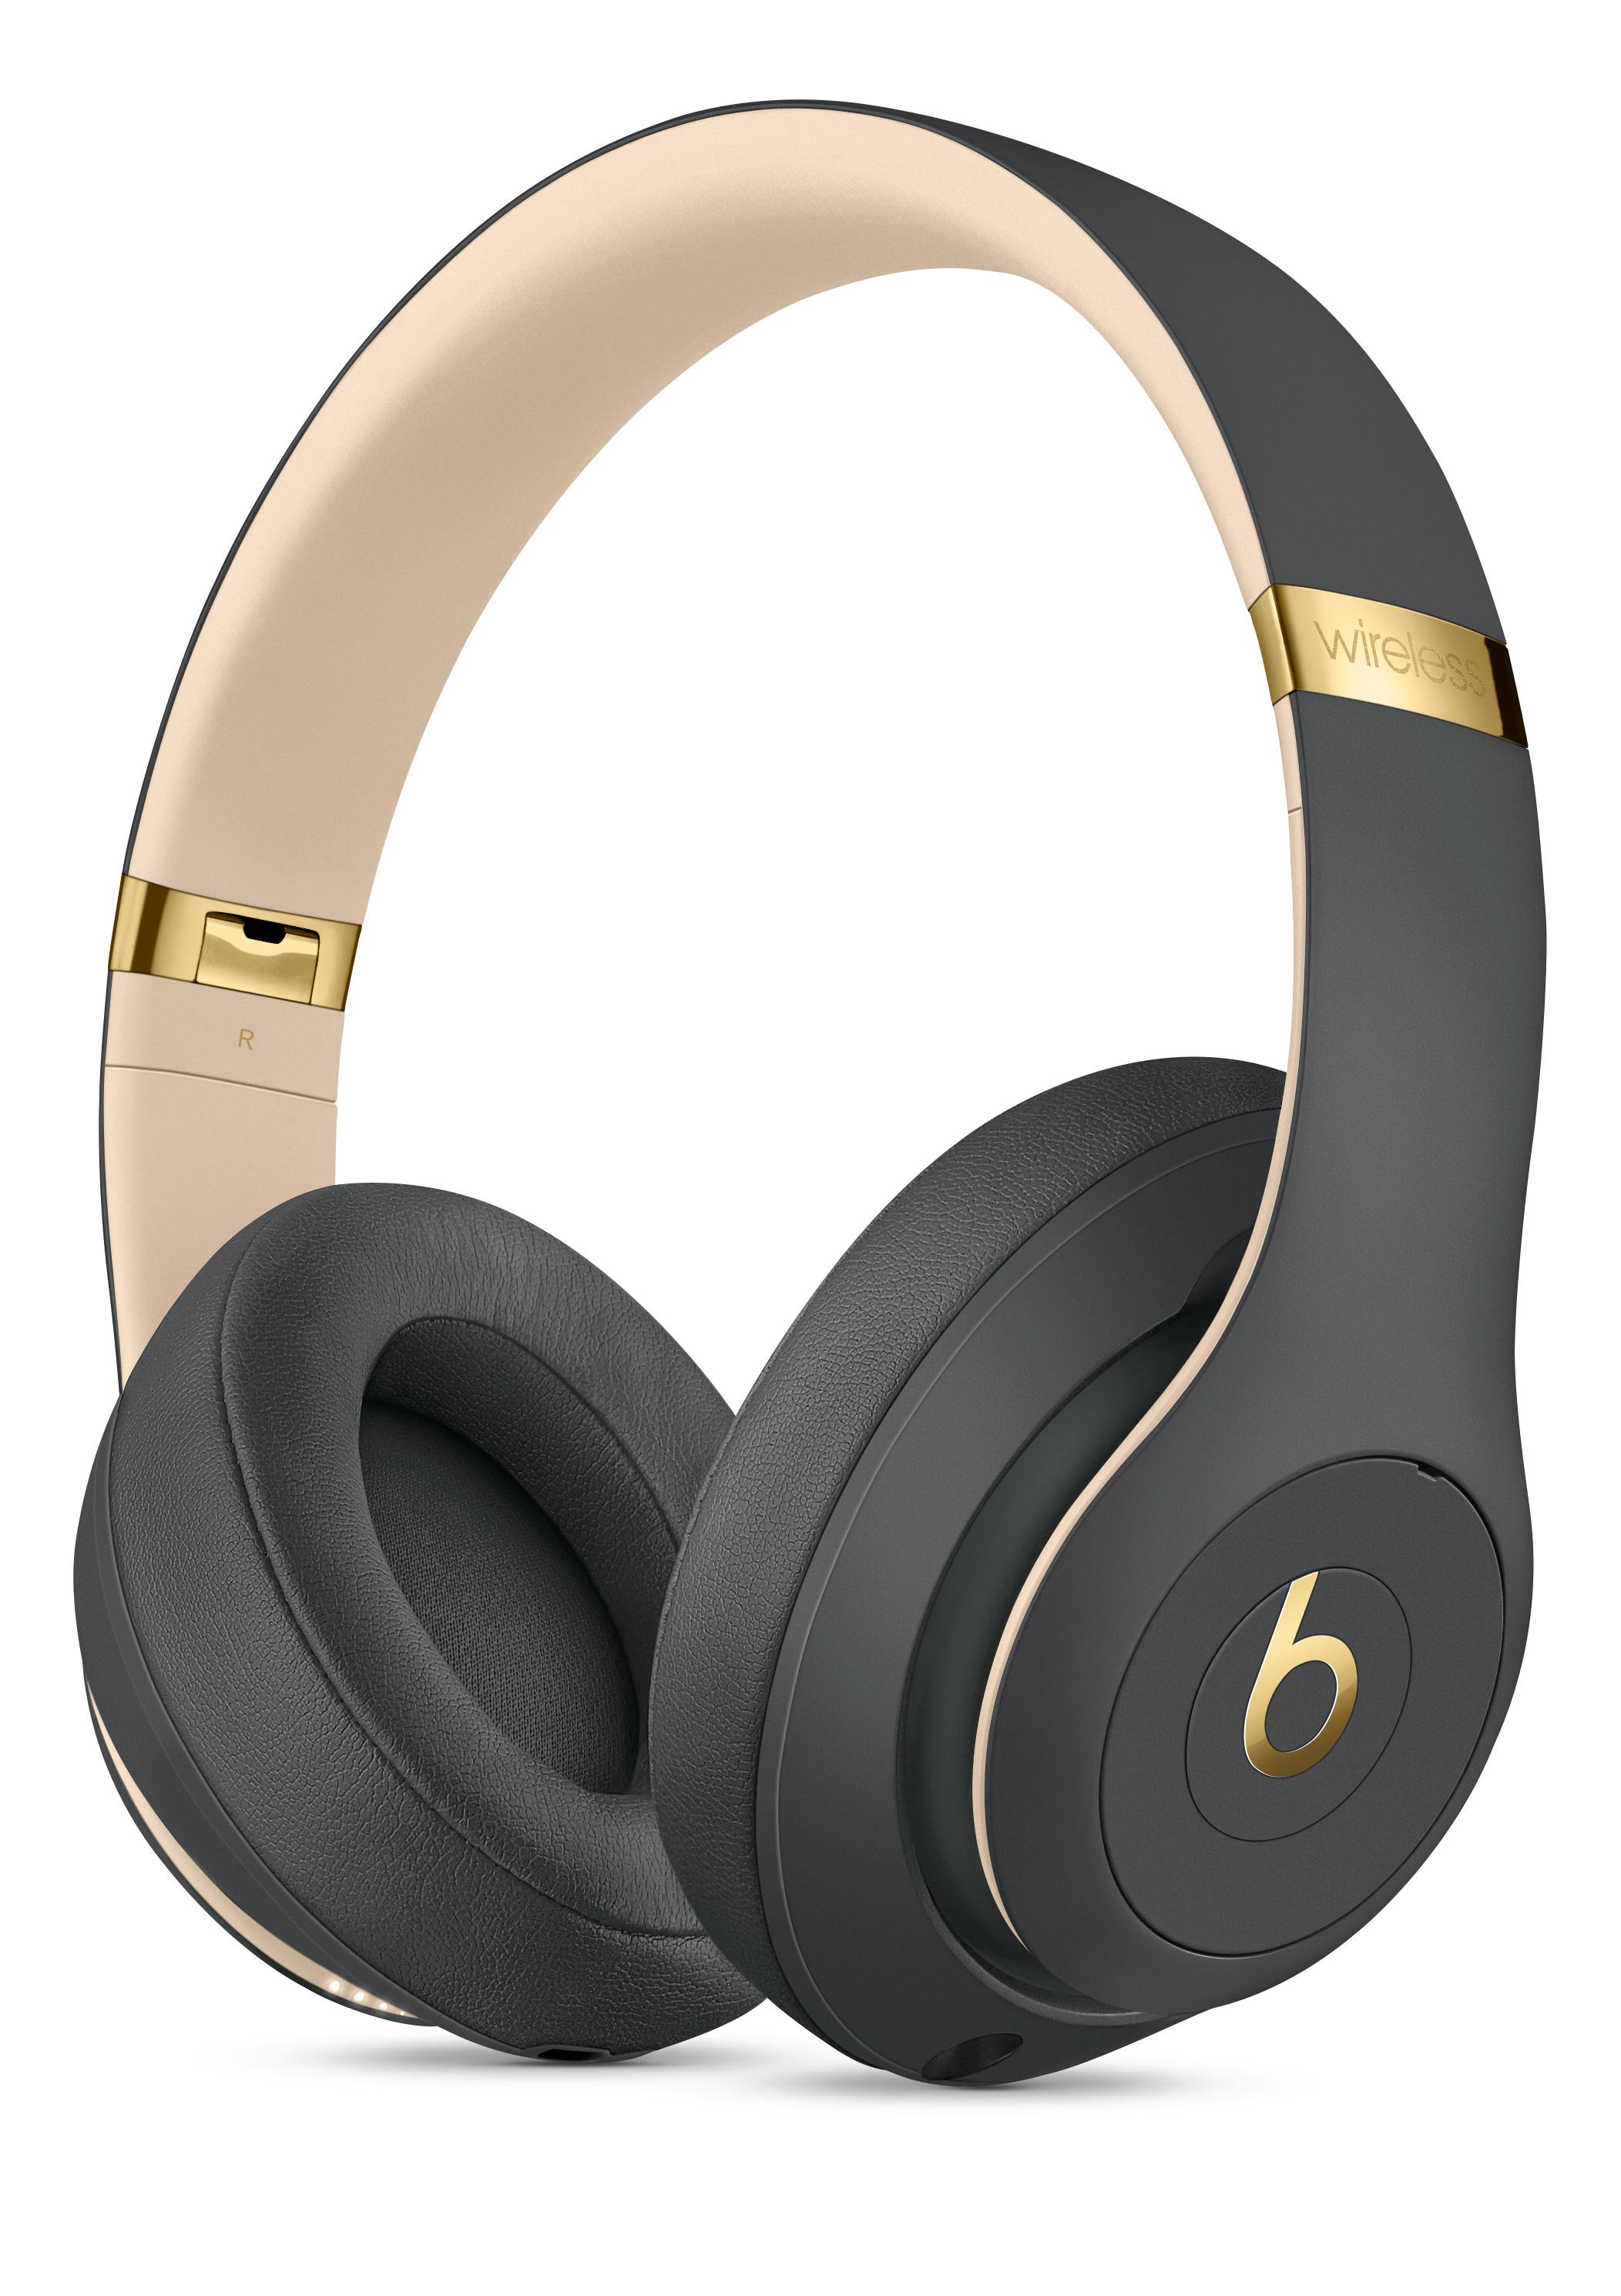 Beats Studio3 Wireless Headphones The Beats Skyline Collection Shadow Gray